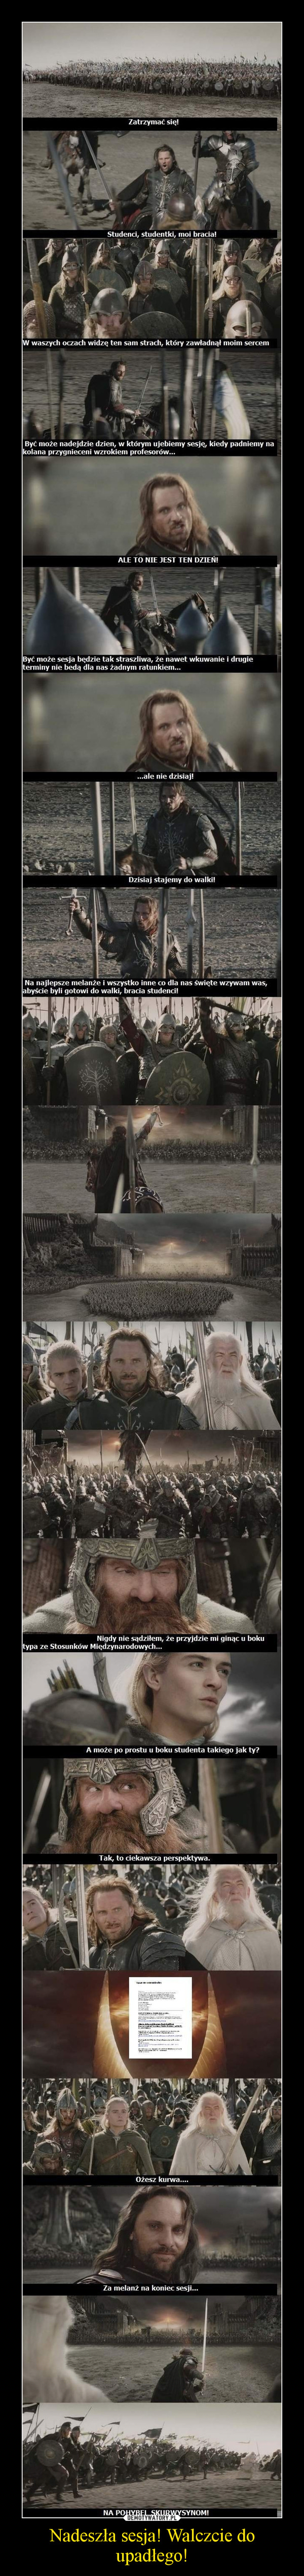 27bf17db172115 Forum dyskusyjne miłośników twórczości J.R.R. Tolkiena :: Humor ...